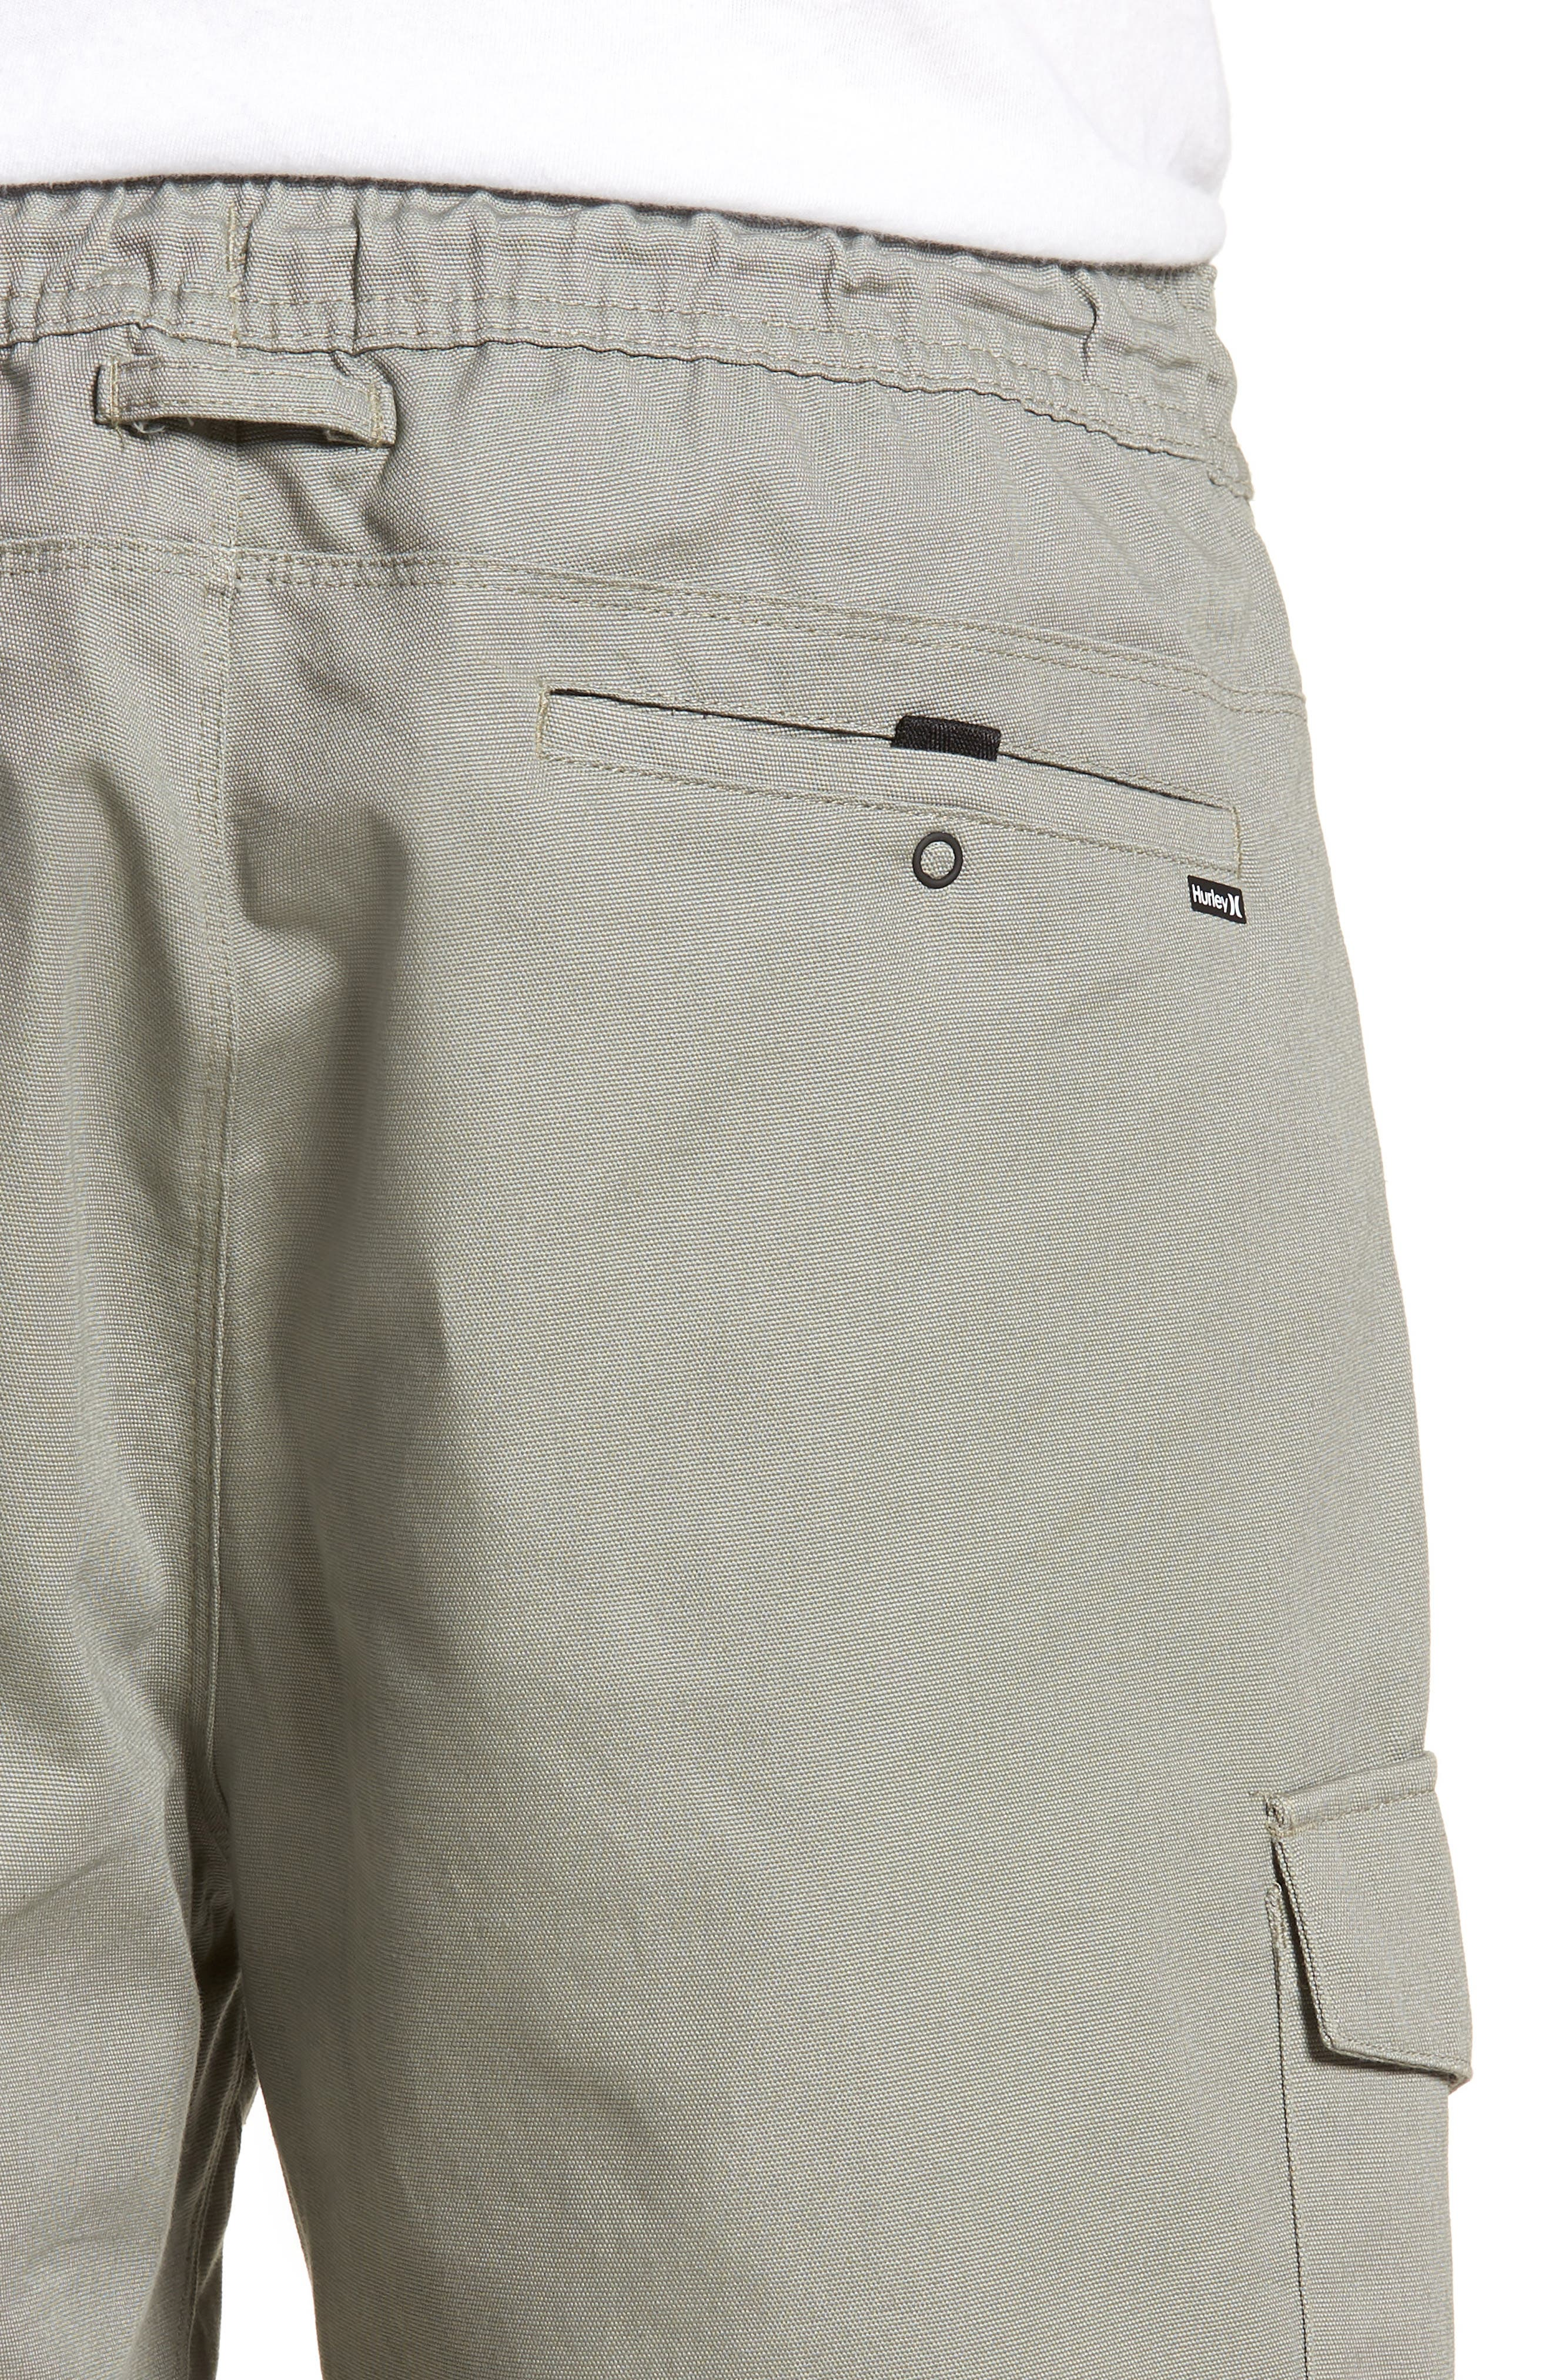 Marsh Cargo Shorts,                             Alternate thumbnail 4, color,                             004